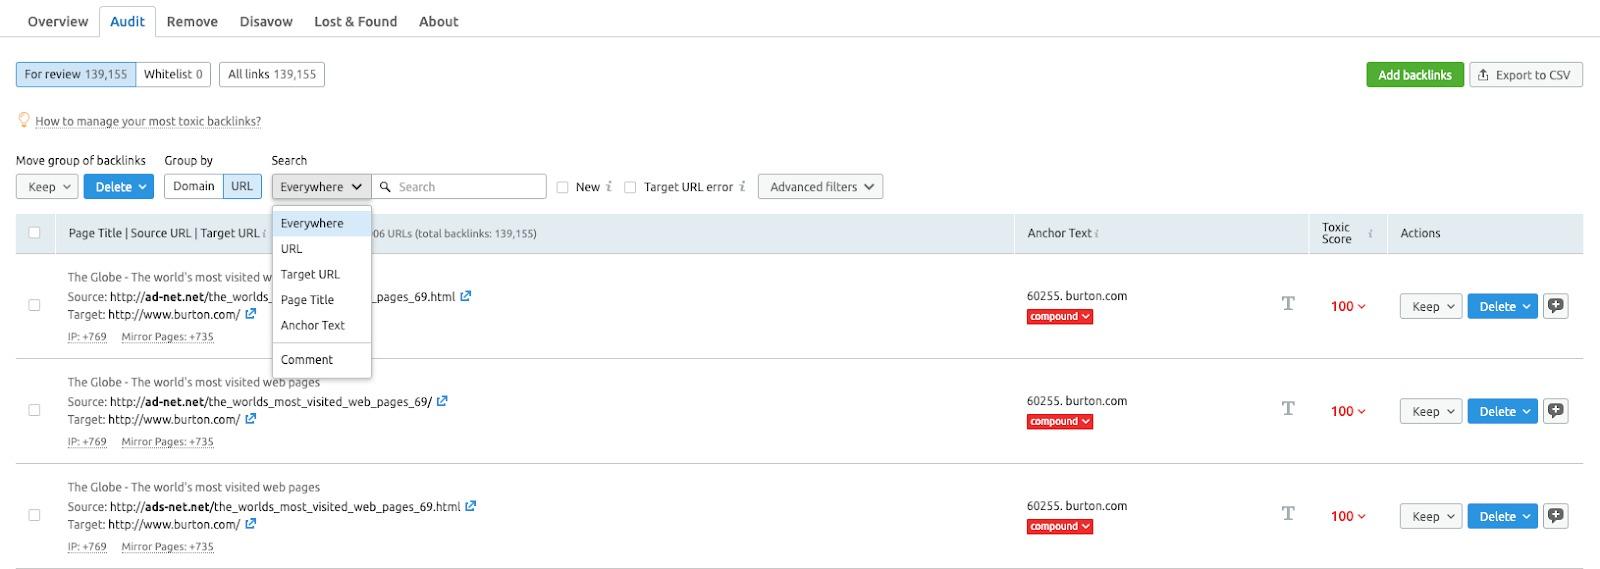 Cómo auditar tus backlinks image 3